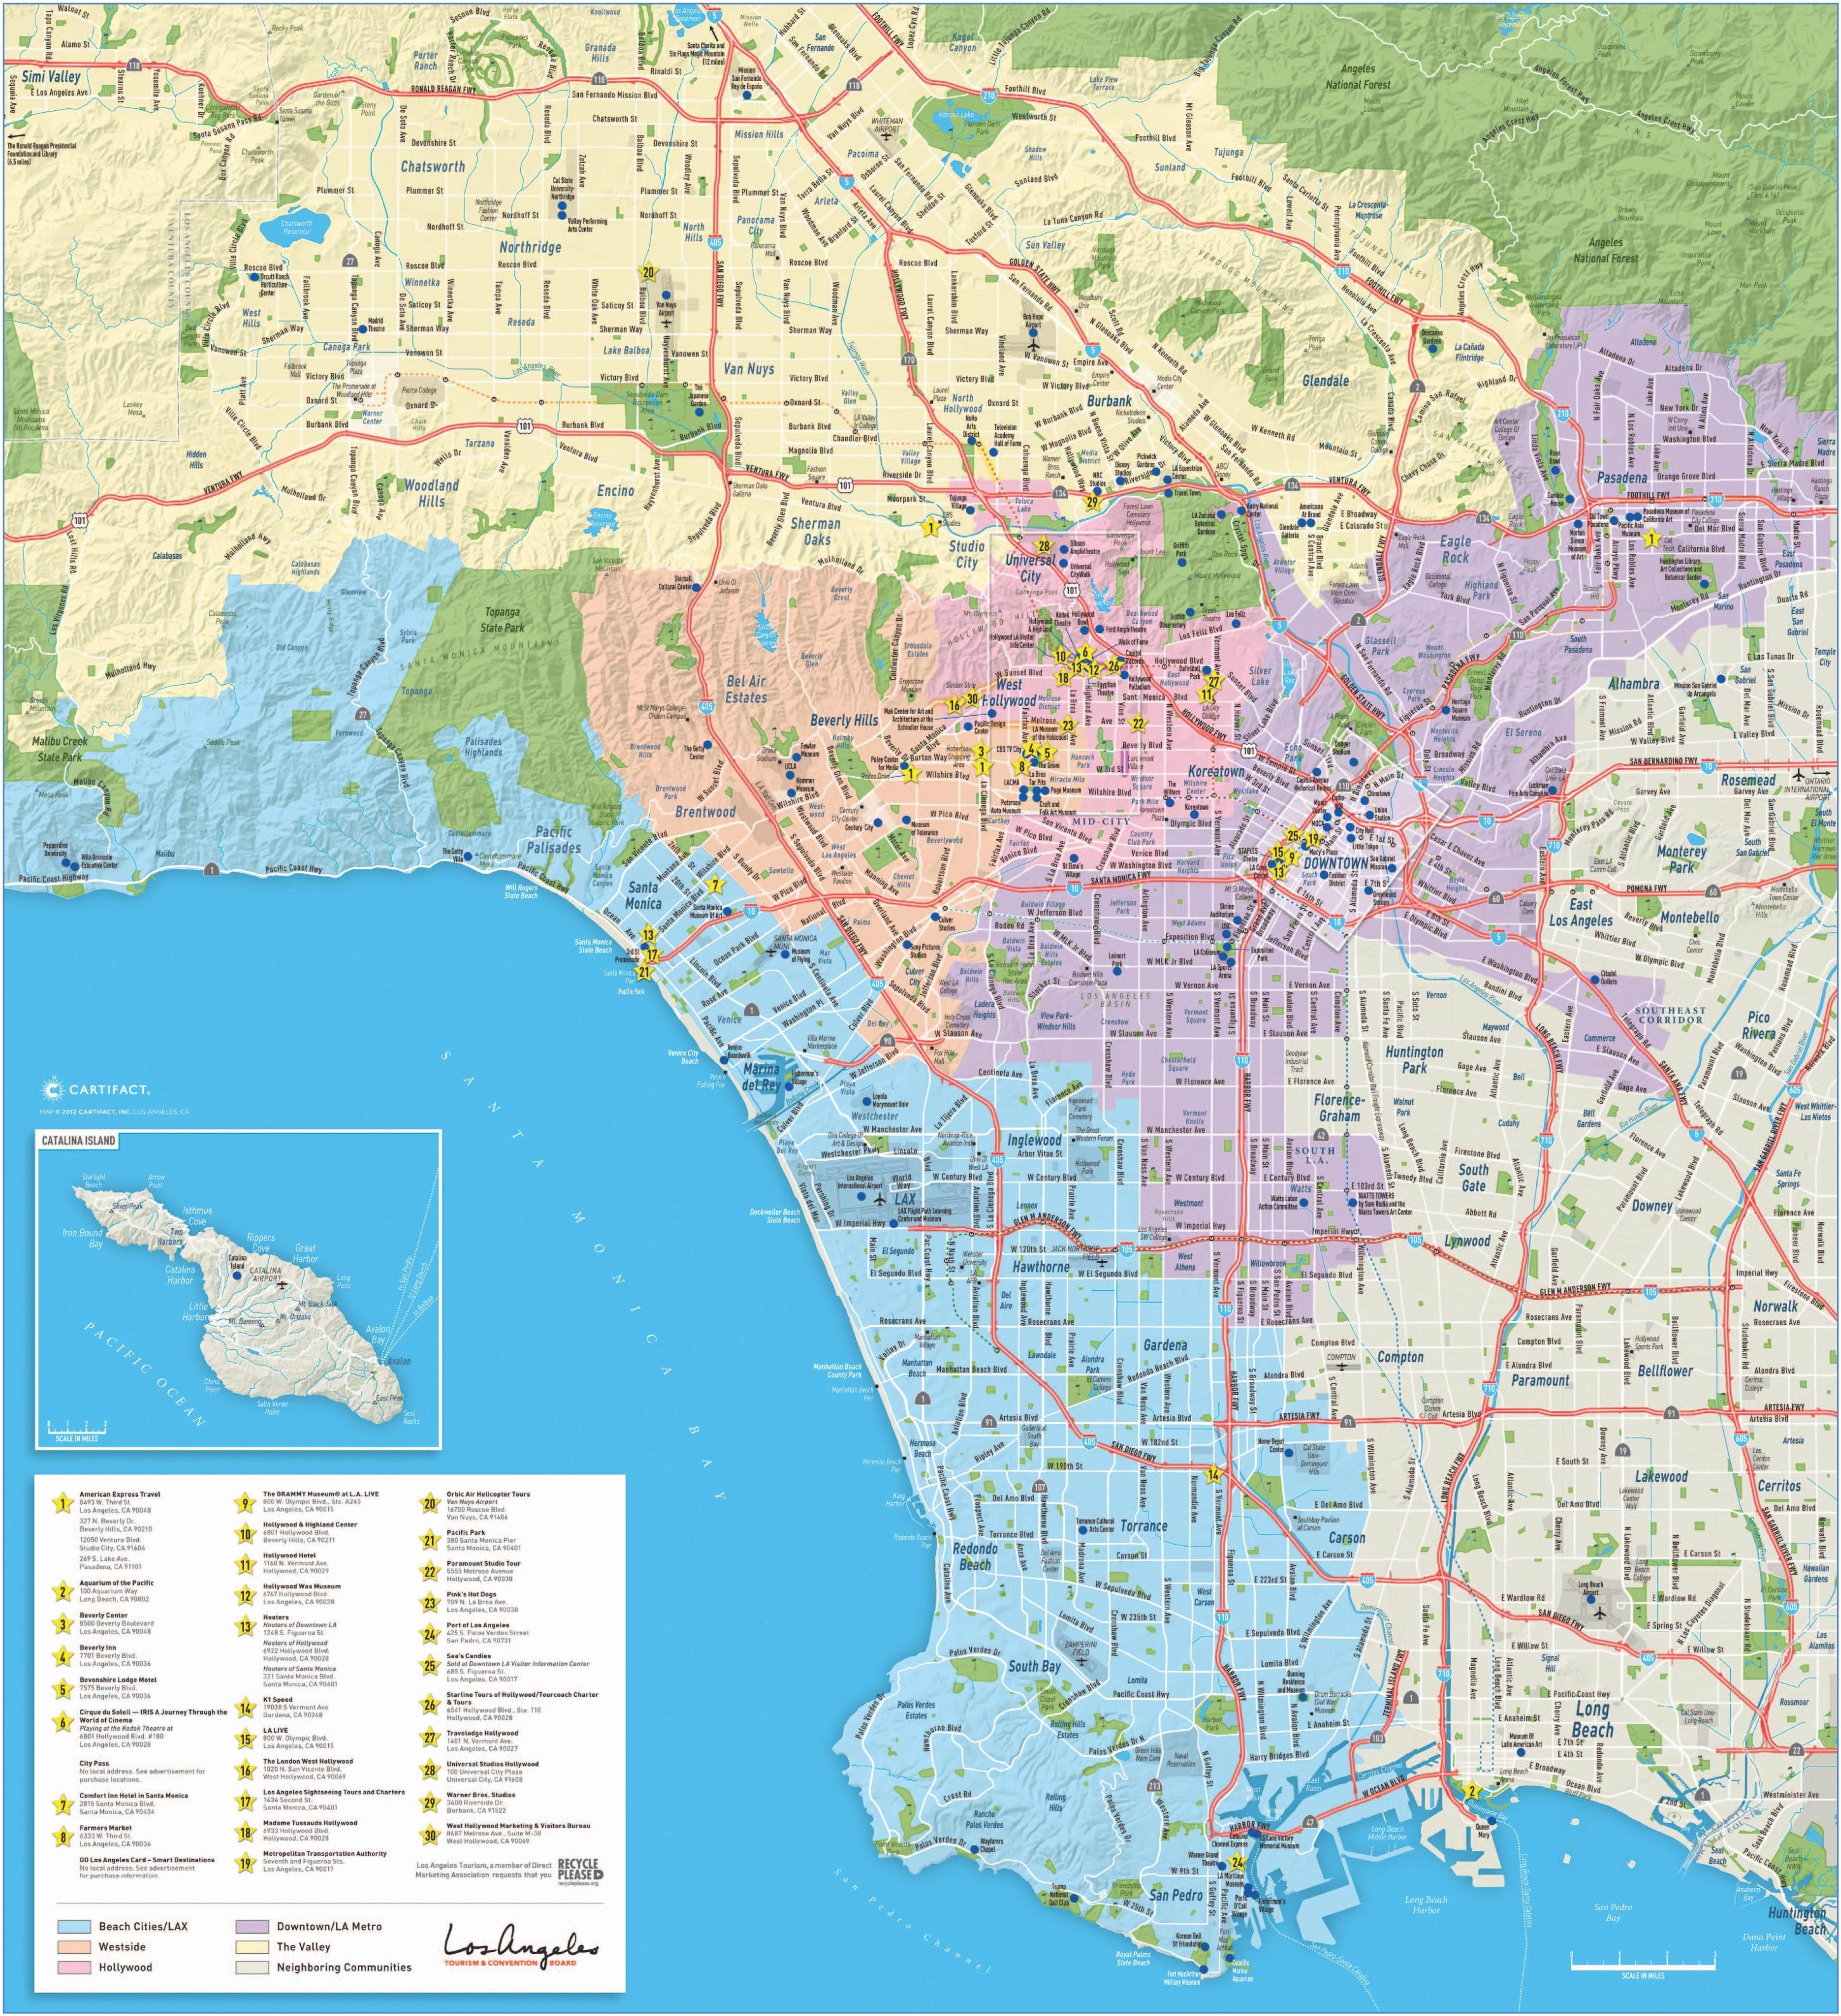 Los Angeles Maps | California, U.s. | Maps Of L.a. (Los Angeles) - Map Of Los Angeles California Area